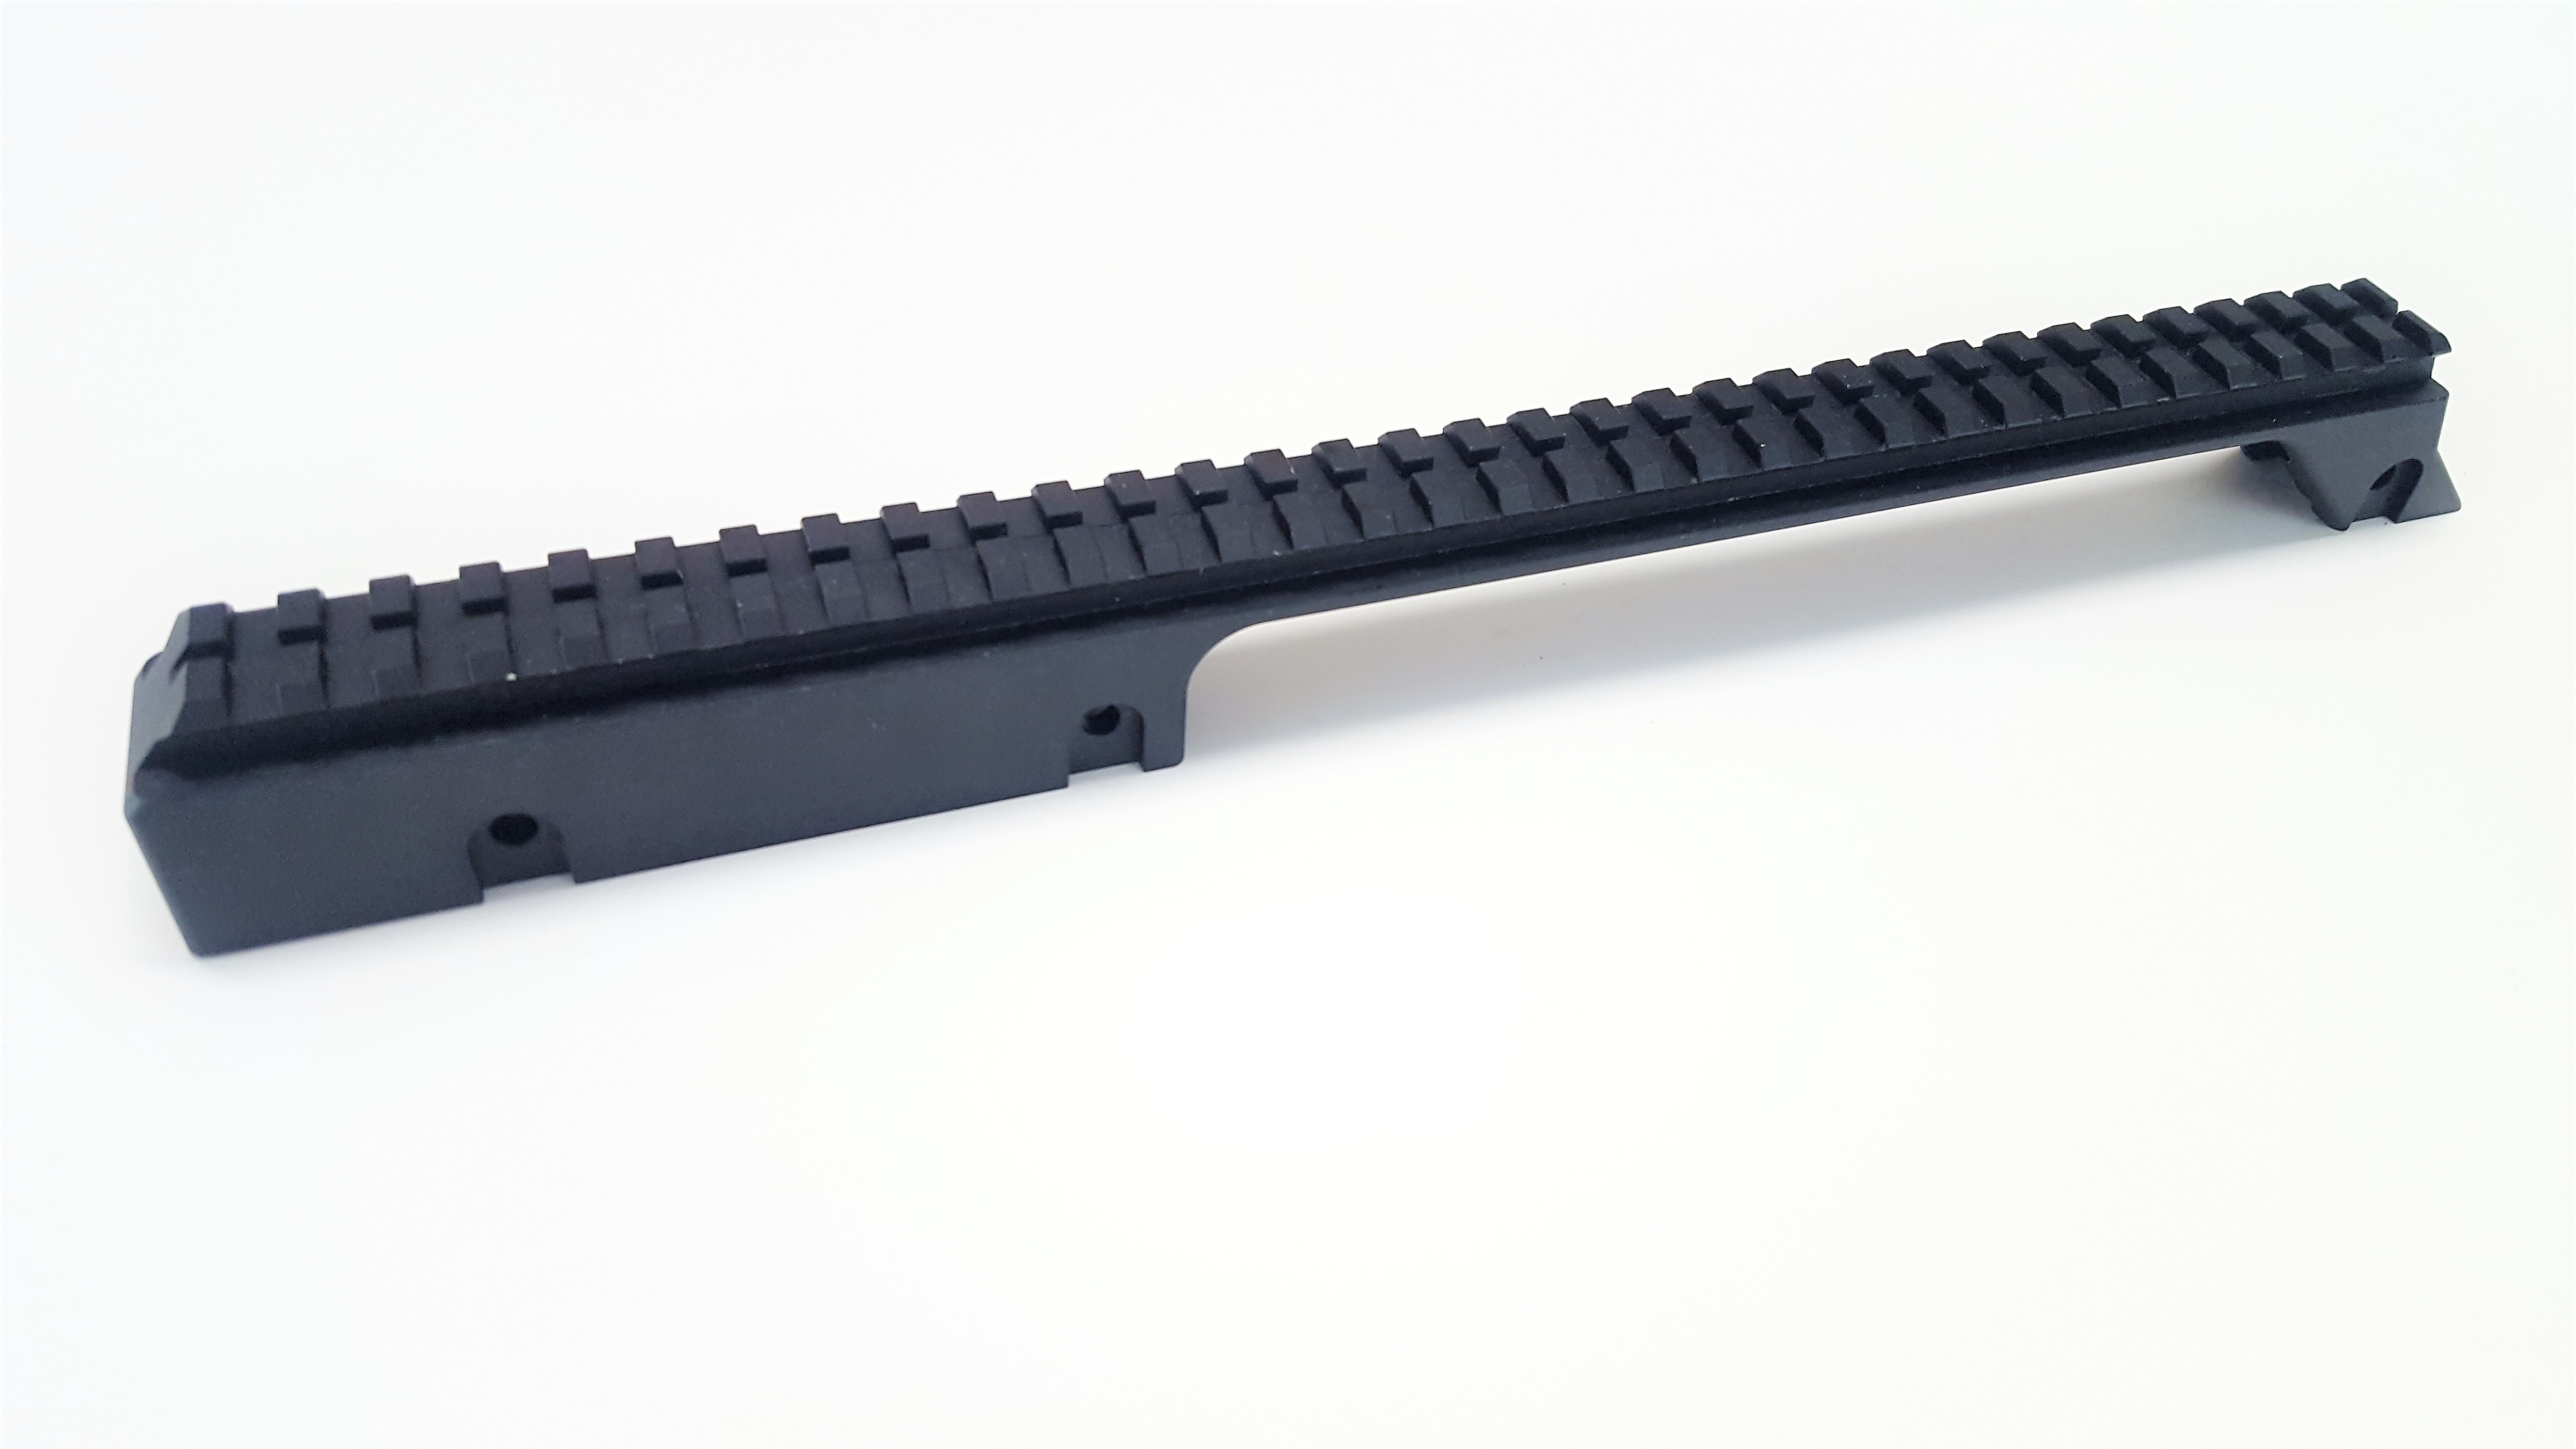 Hk g sl aluminum scope top rail